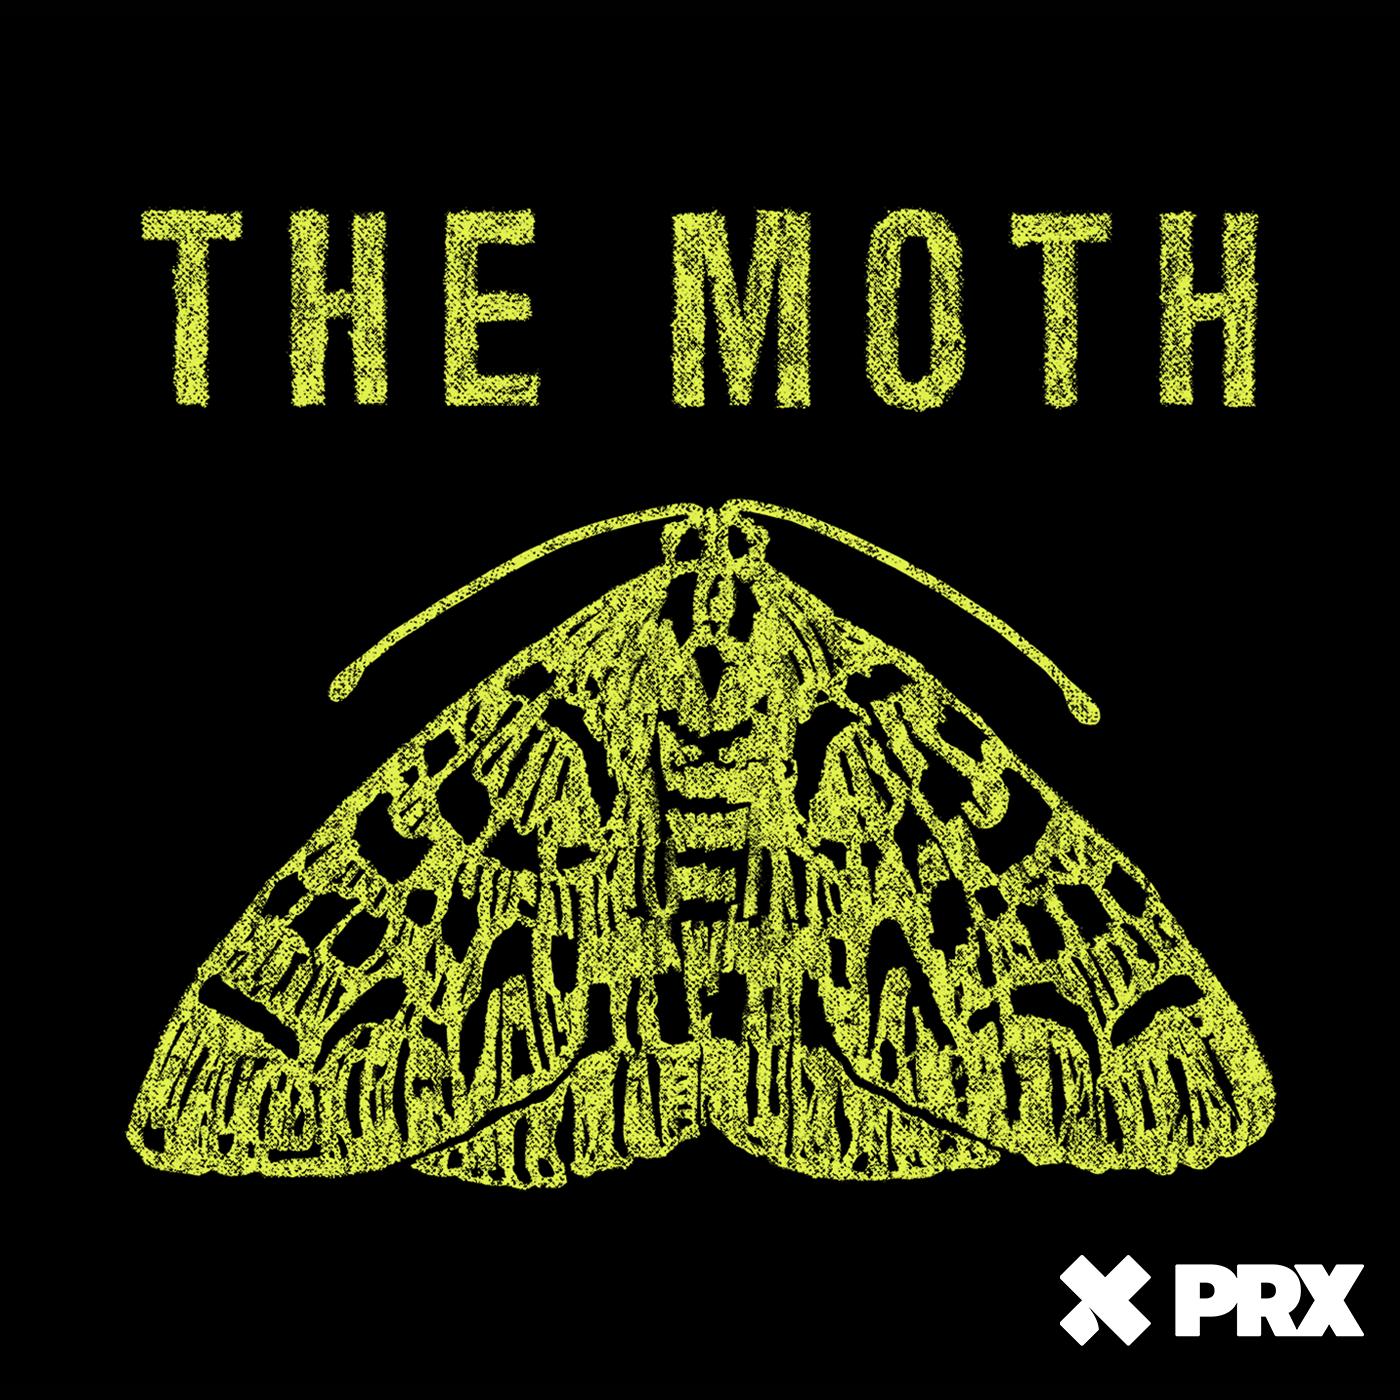 The Moth Radio Hour: Antidepressants and Anthony Hopkins